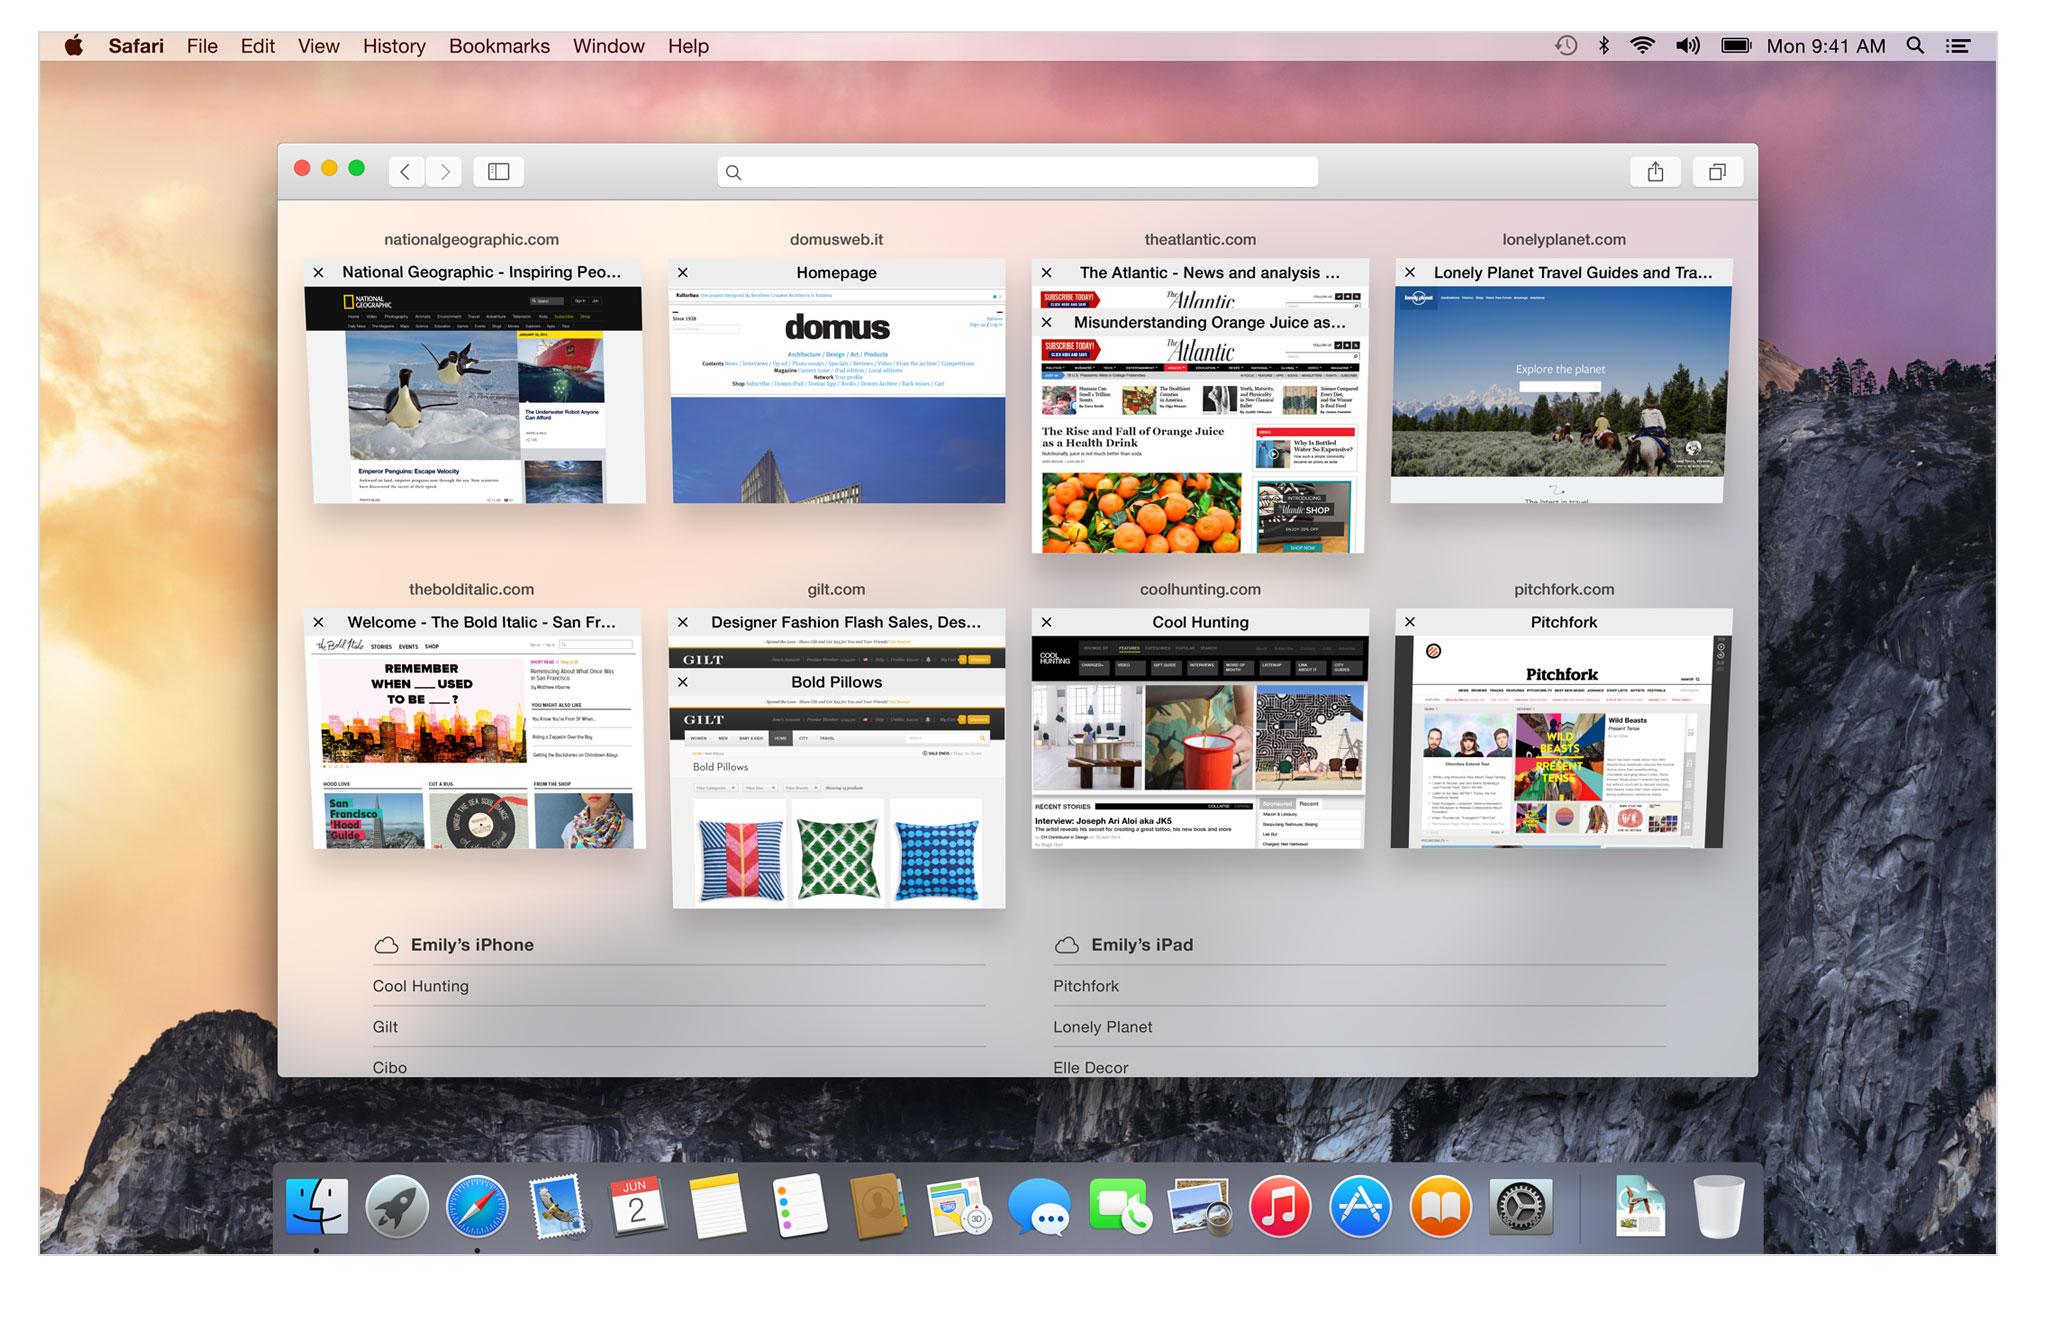 Mac os x 10.5 software